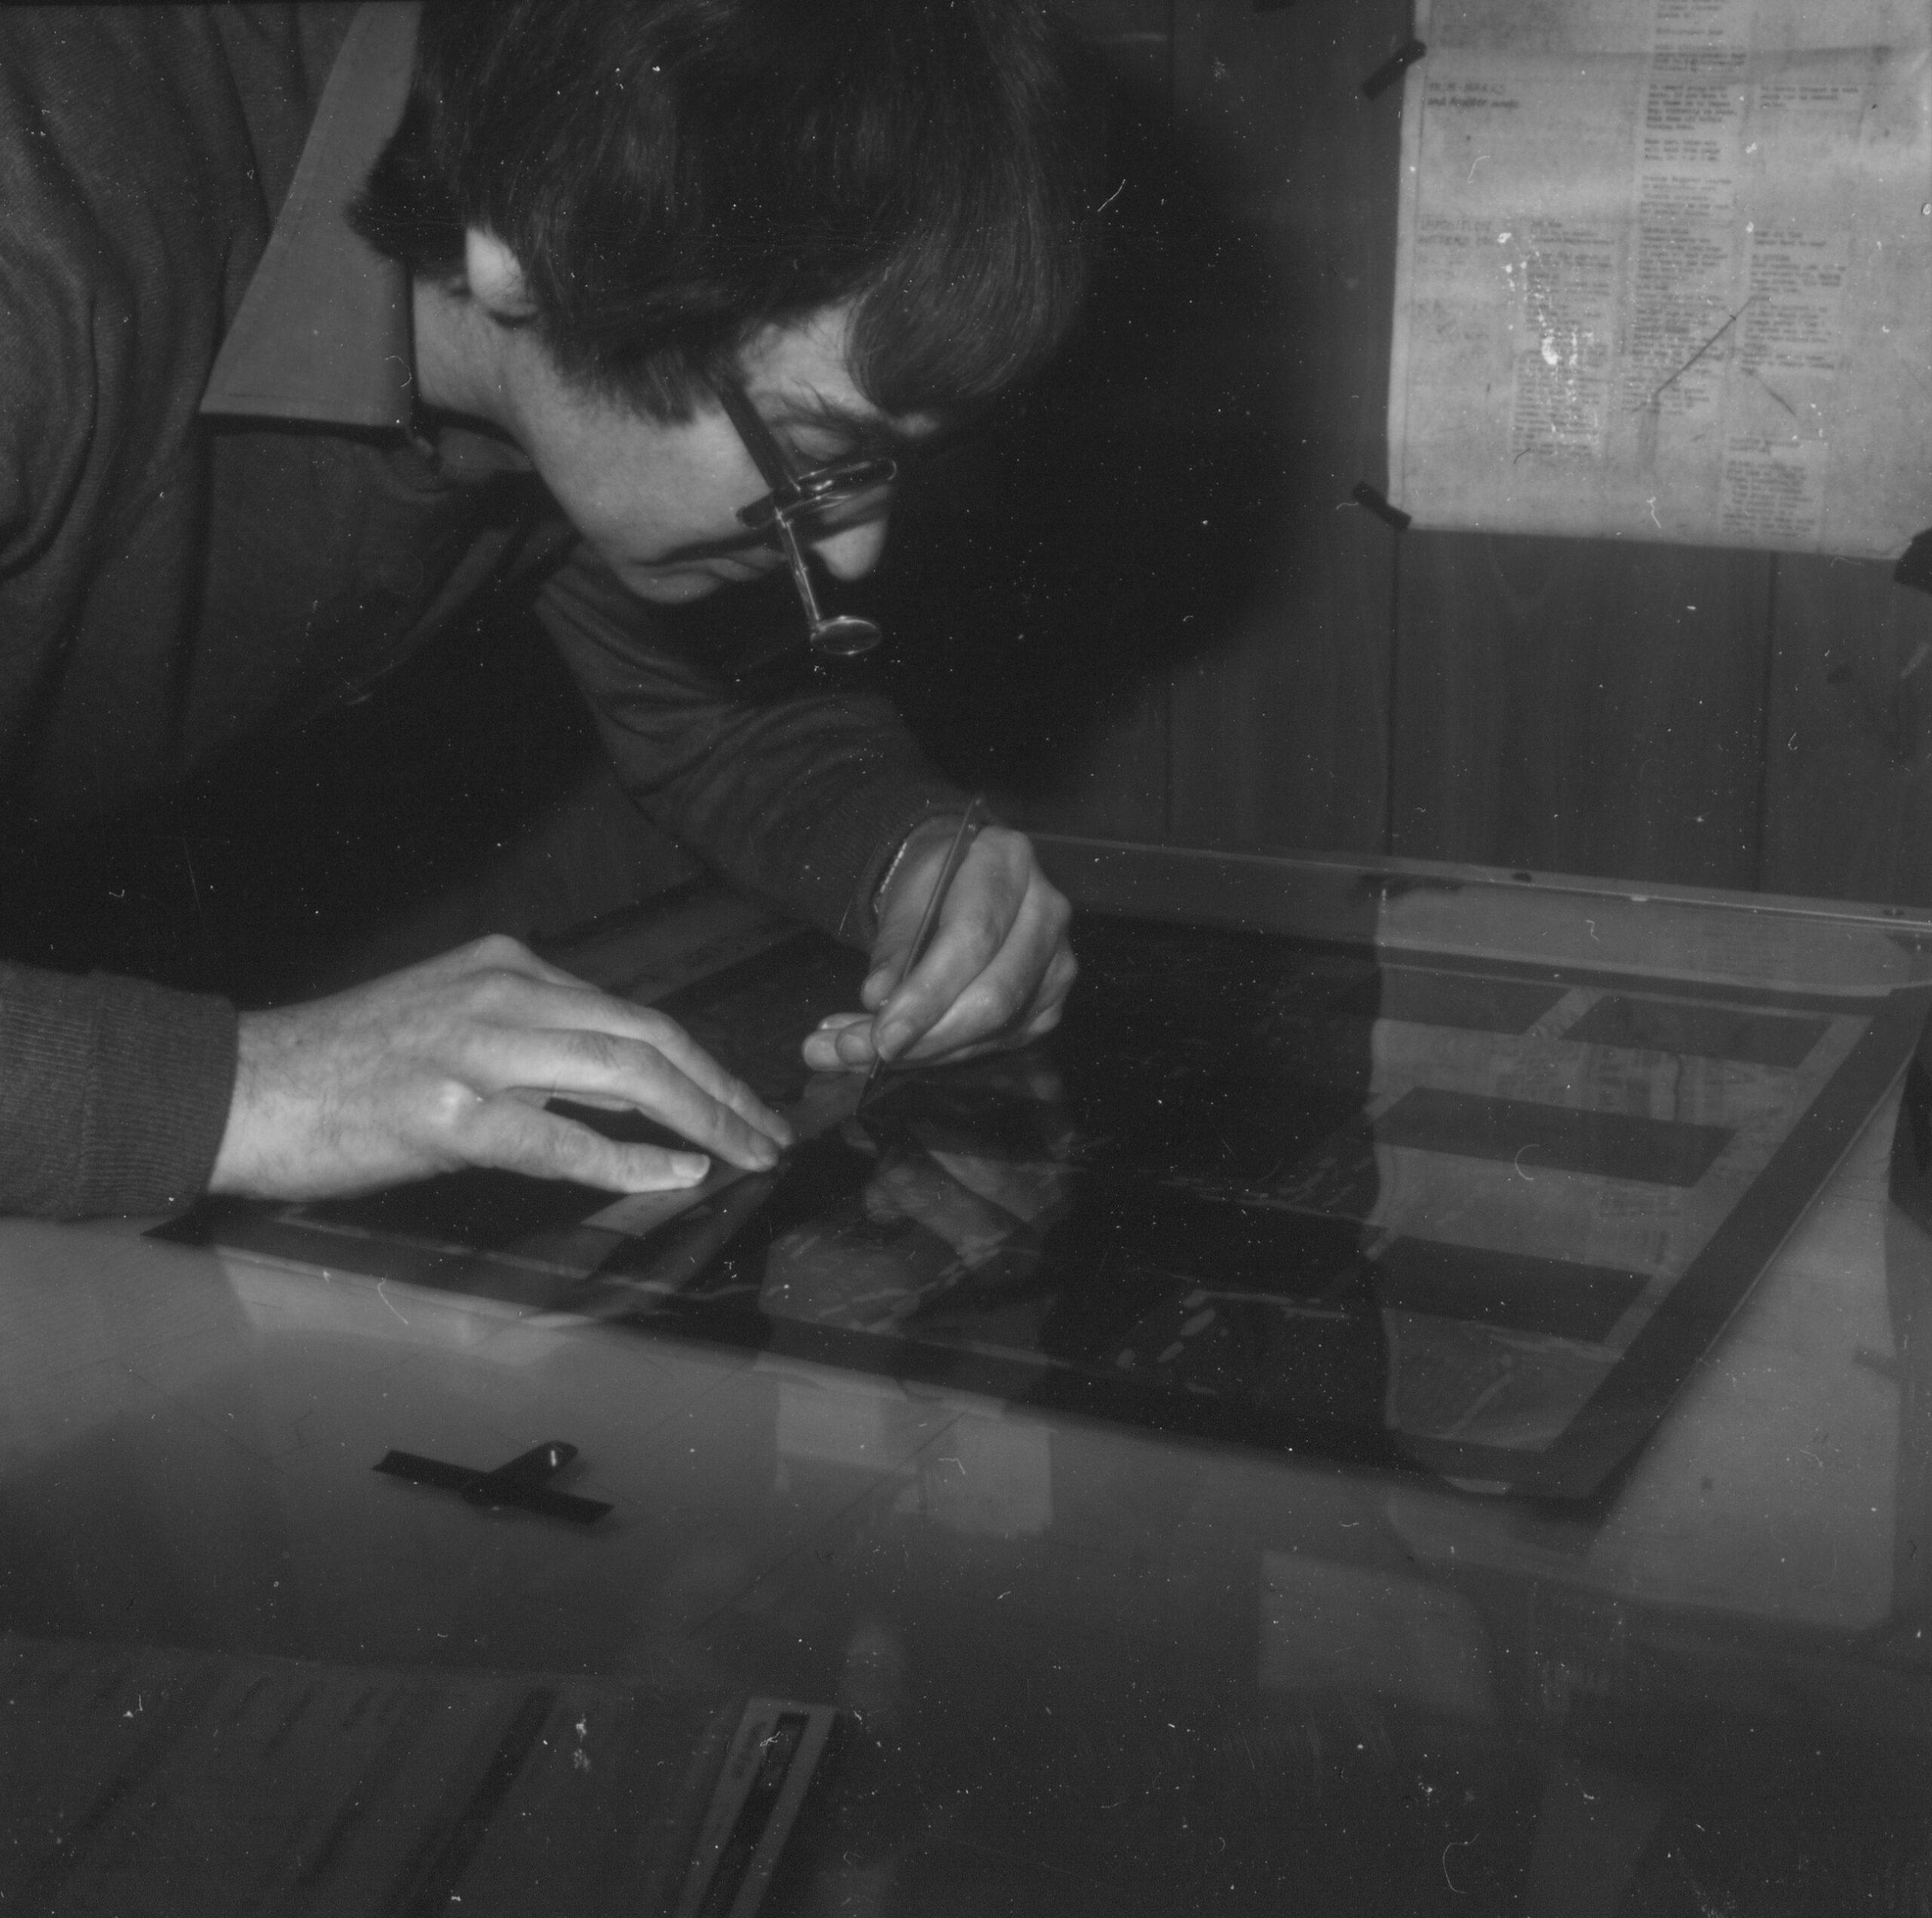 Man looking at film on lightbox